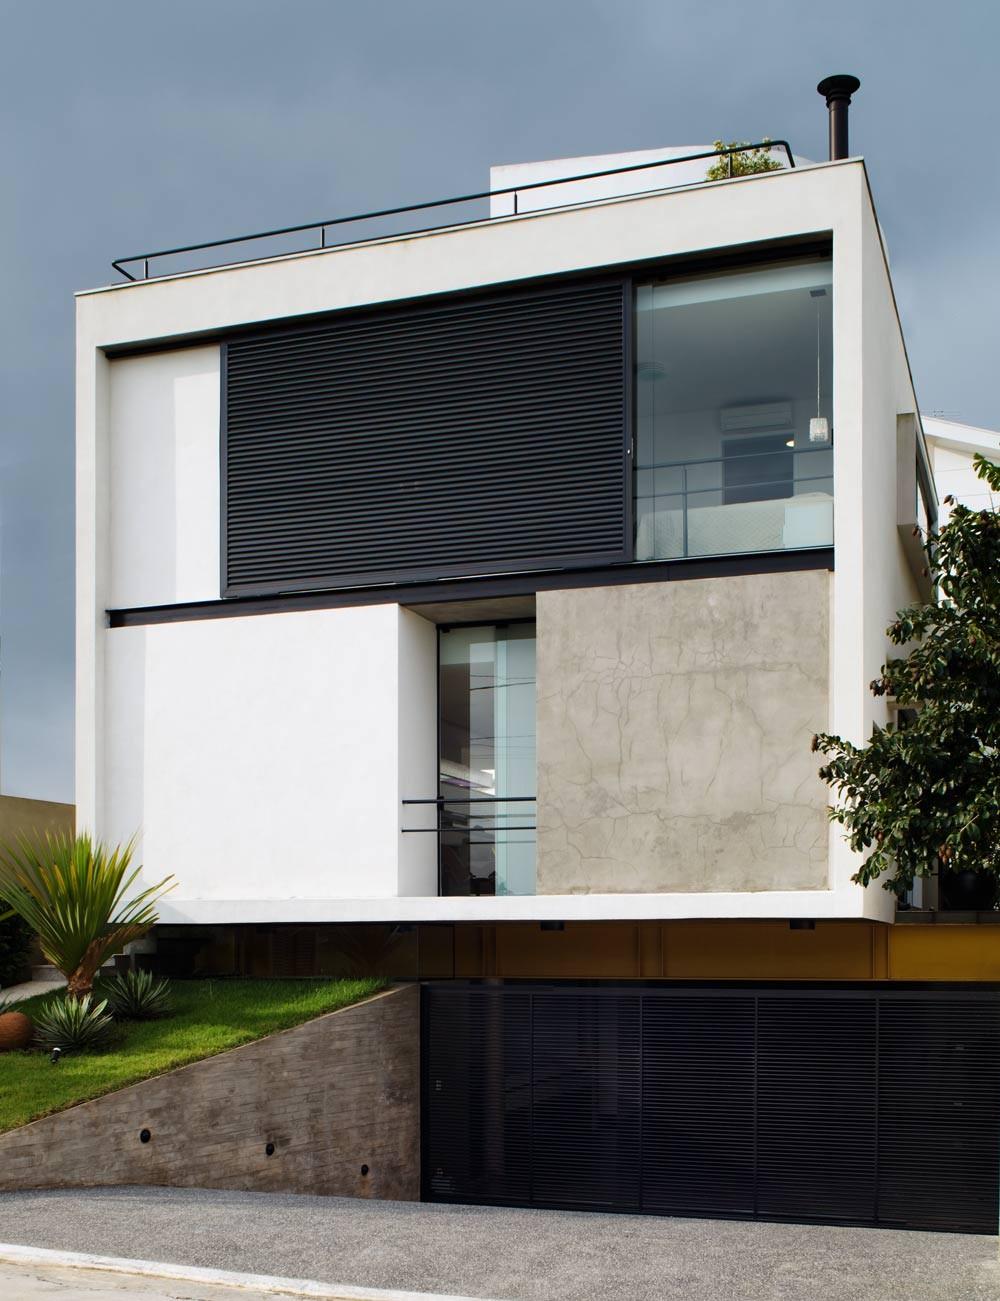 Residencia Mirante do Horto / Flavio Castro Arquitetos, © Nelson Kon